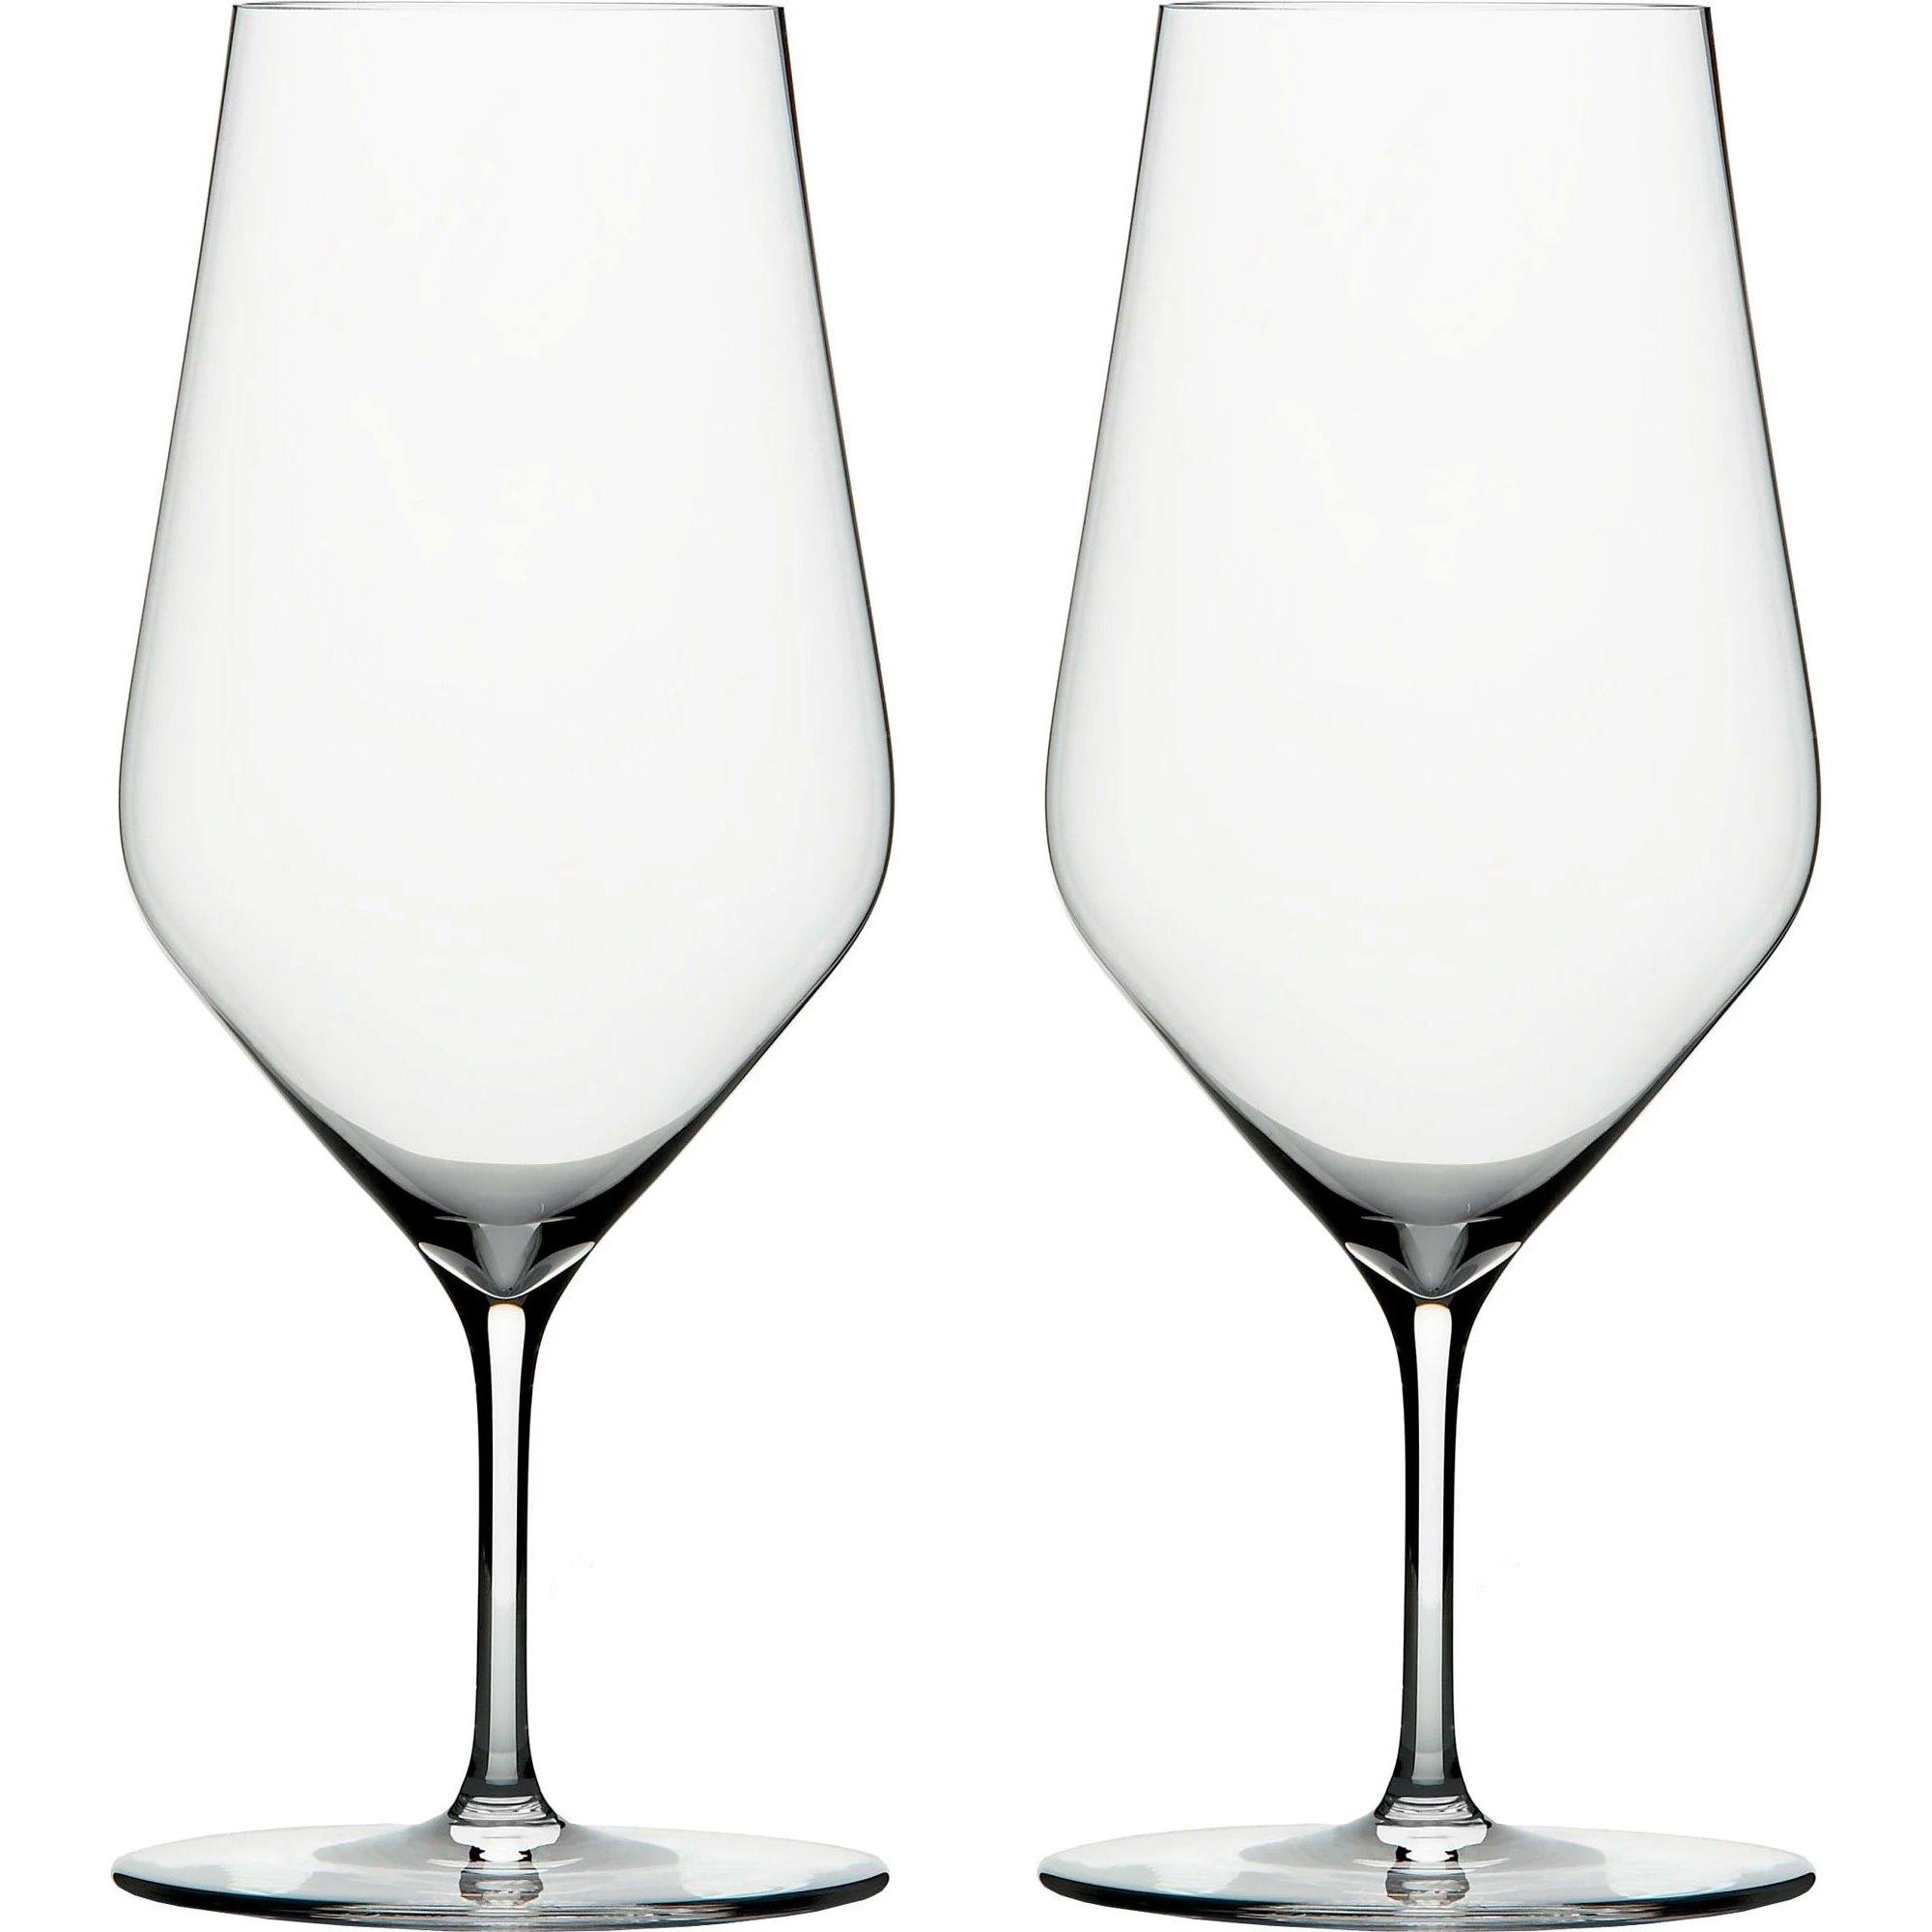 Zalto Vattenglas 400 ml. 2 st.